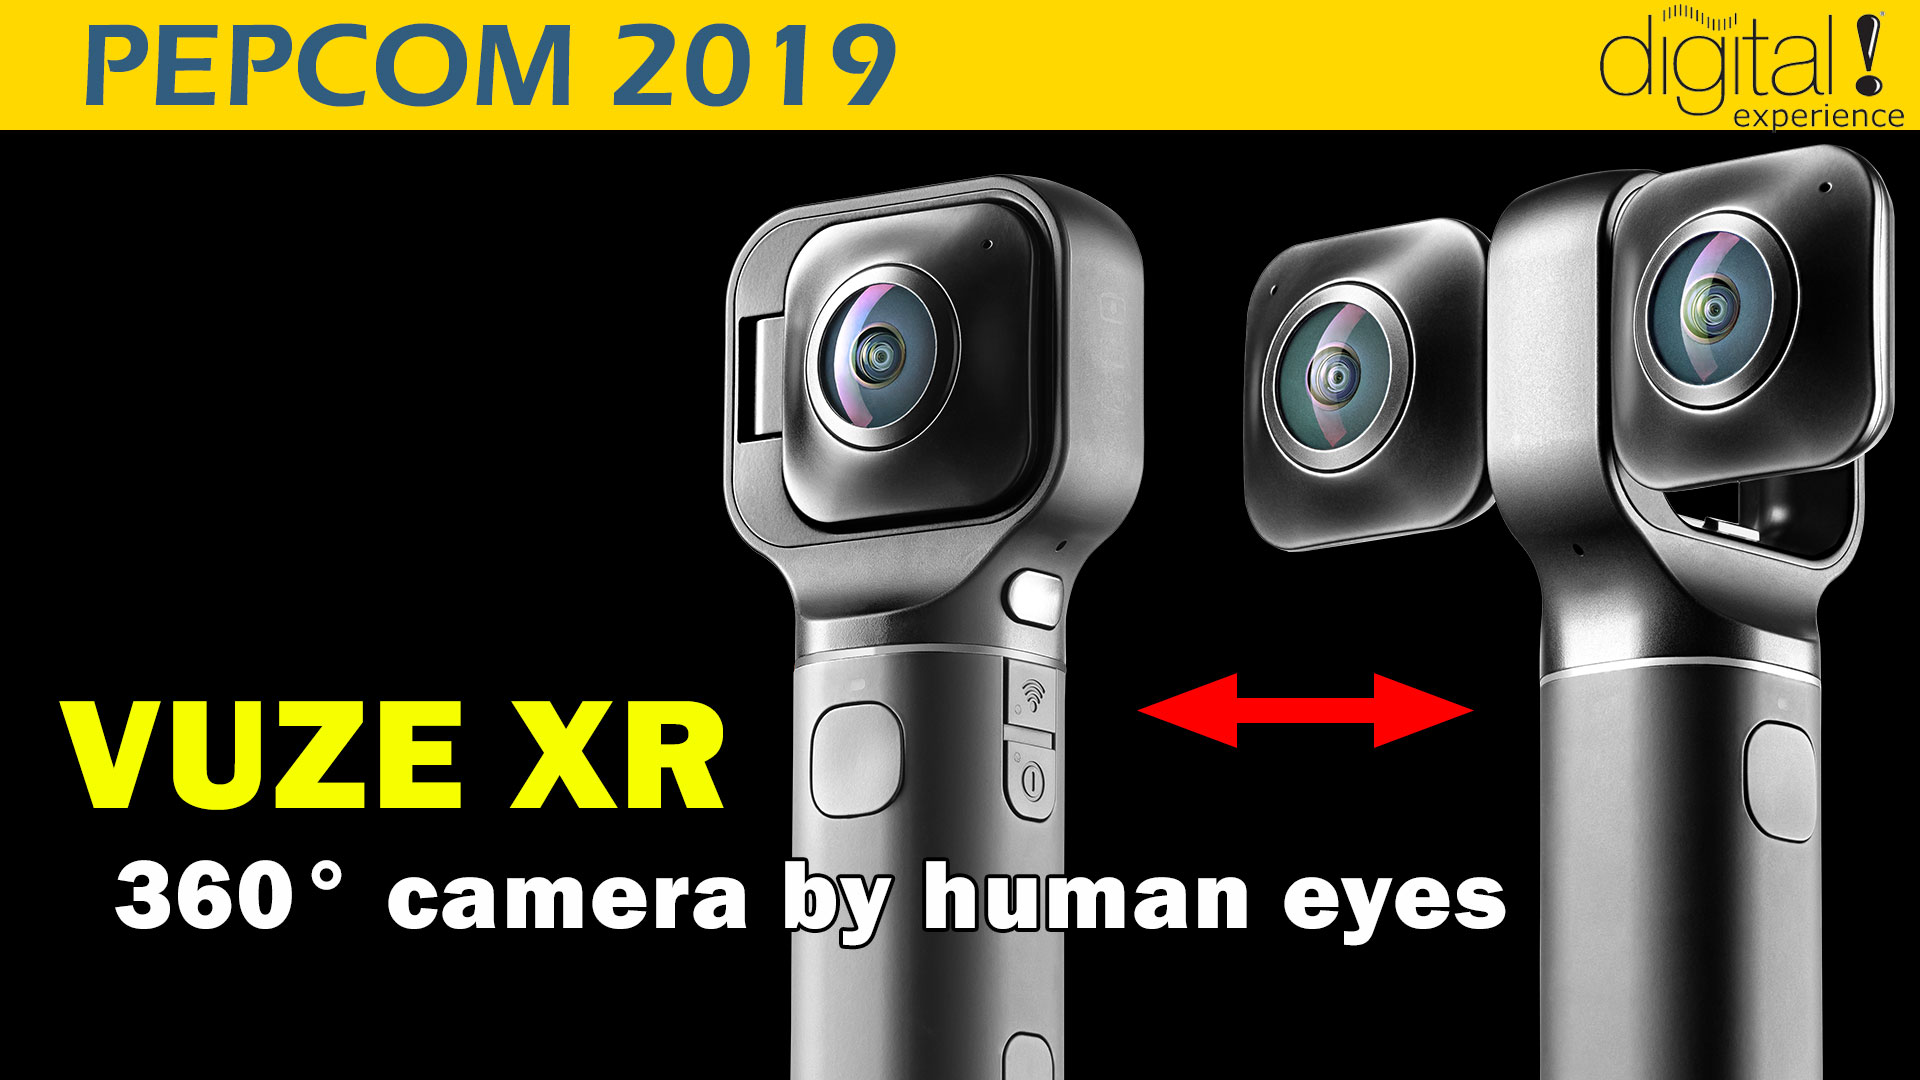 Vuze 360 degree camera